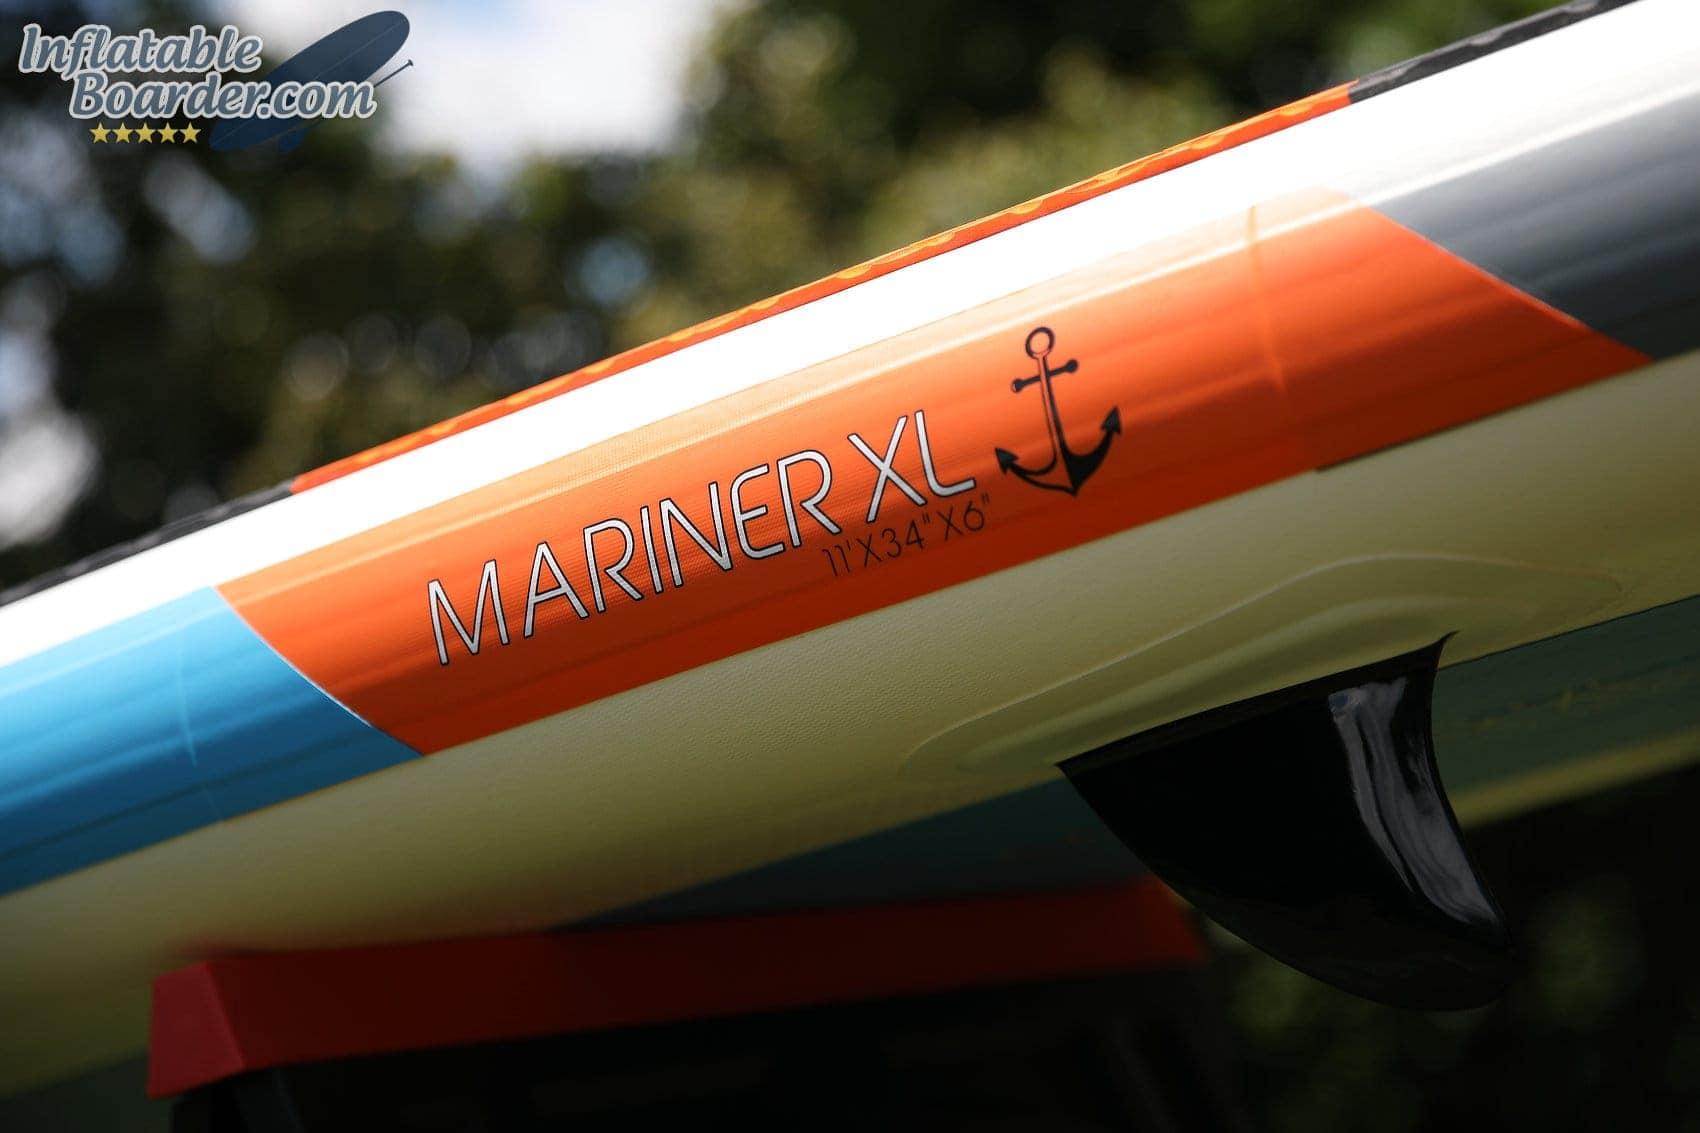 Mariner XL Paddle Board Rail